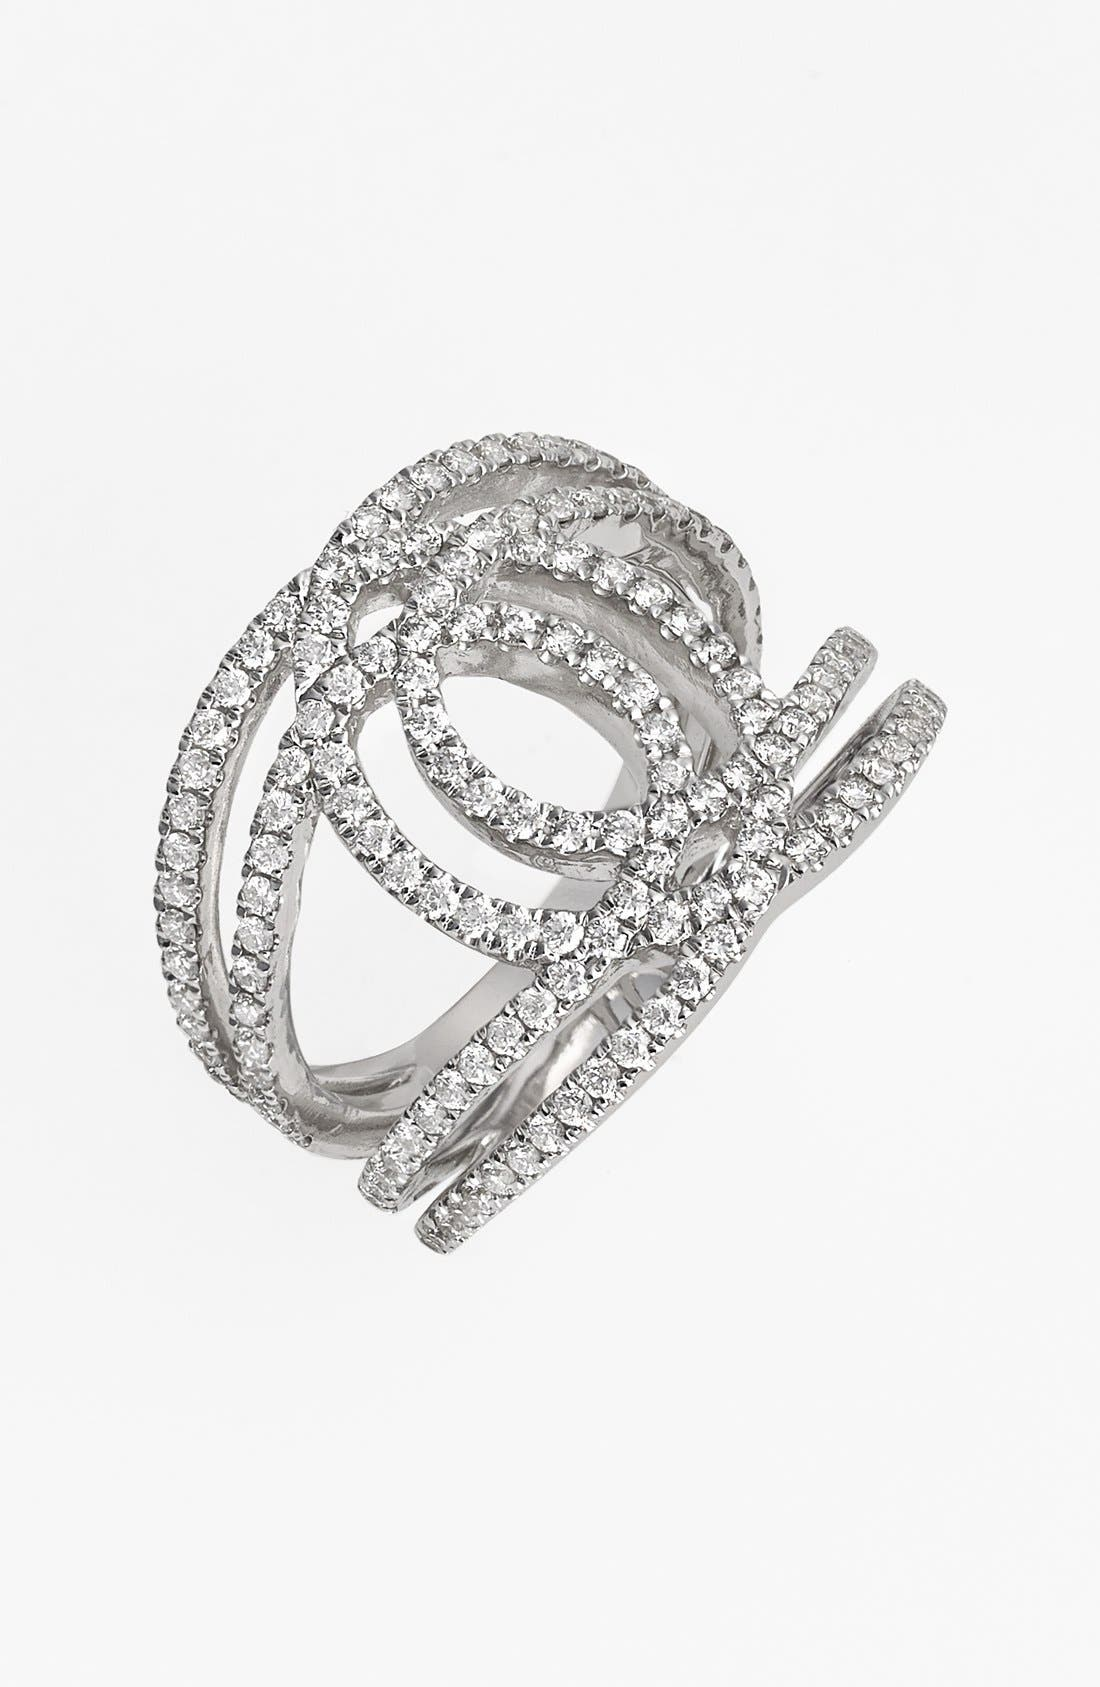 Main Image - Bony Levy 'Double Interlock' Diamond Cocktail Ring (Nordstrom Exclusive)